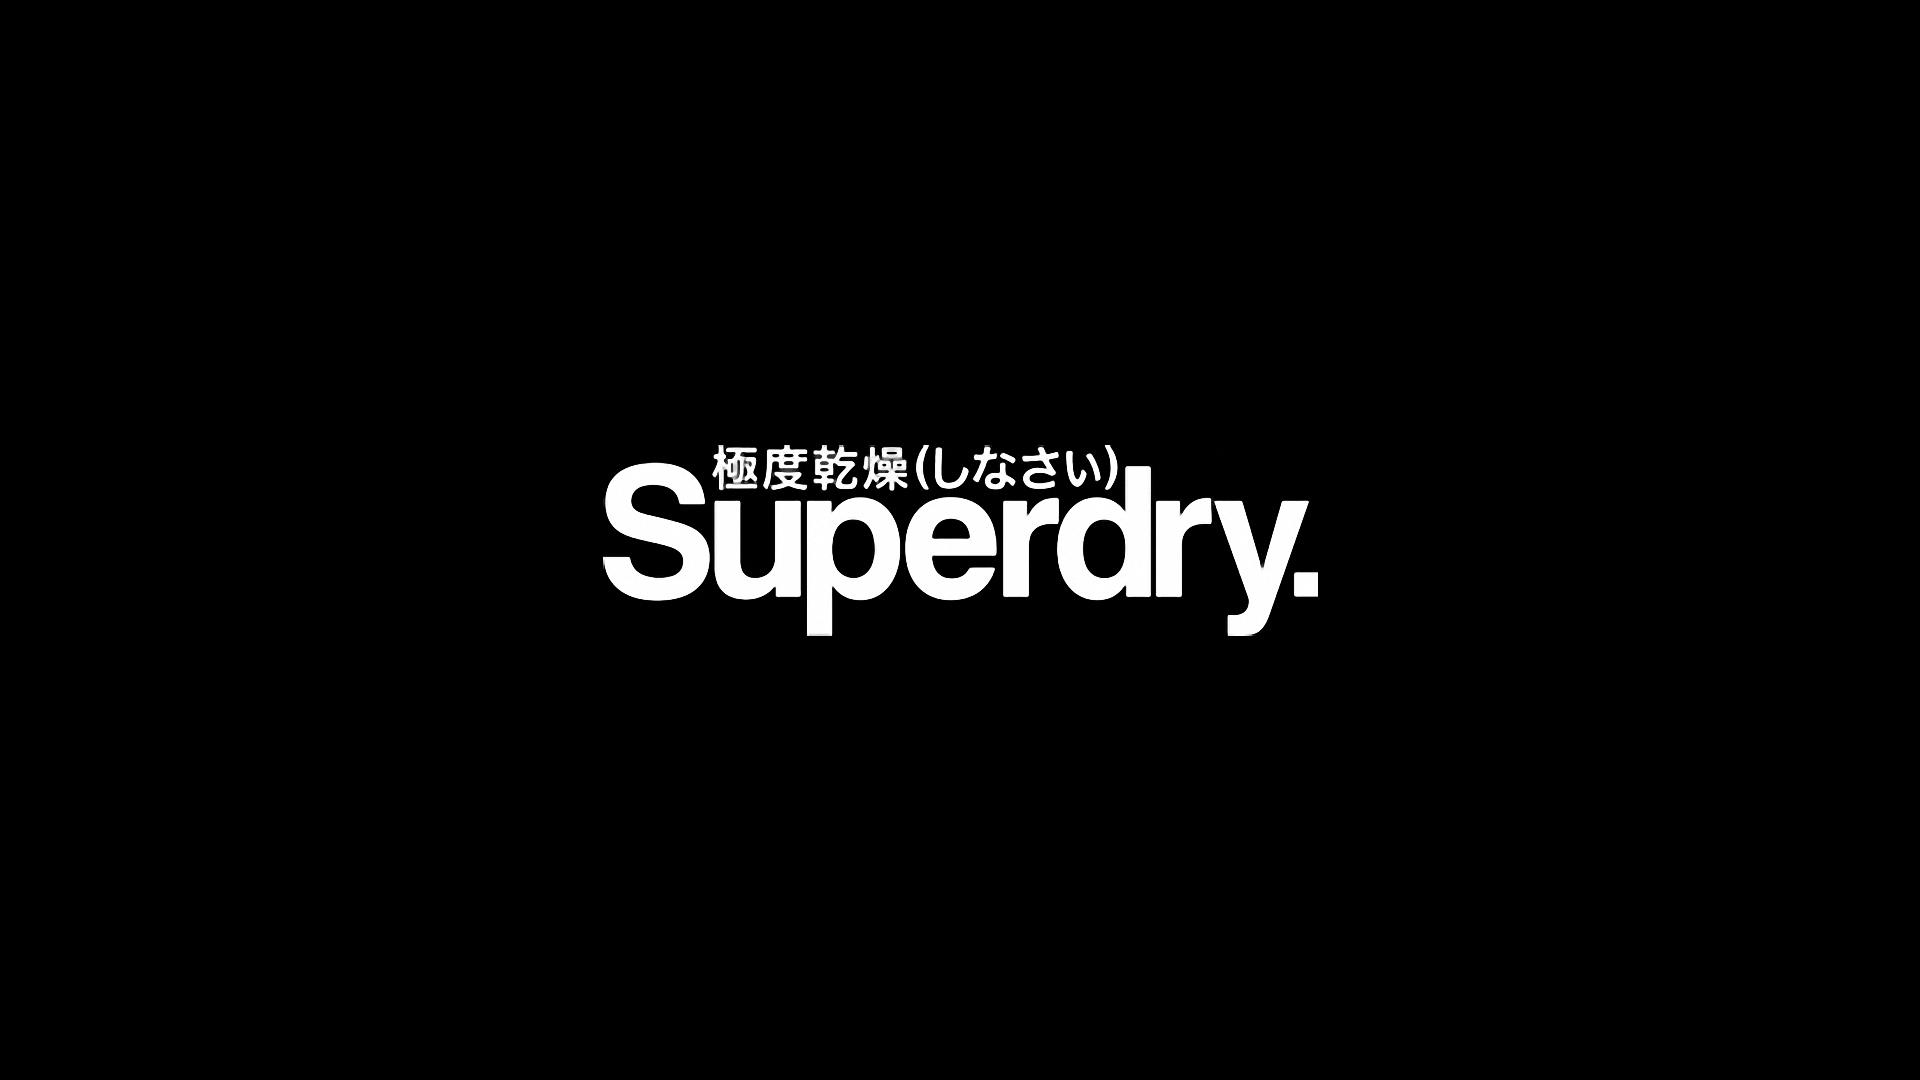 Bargain of the Week Superdry eBay Outlet UK   ShopandBox 1920x1080